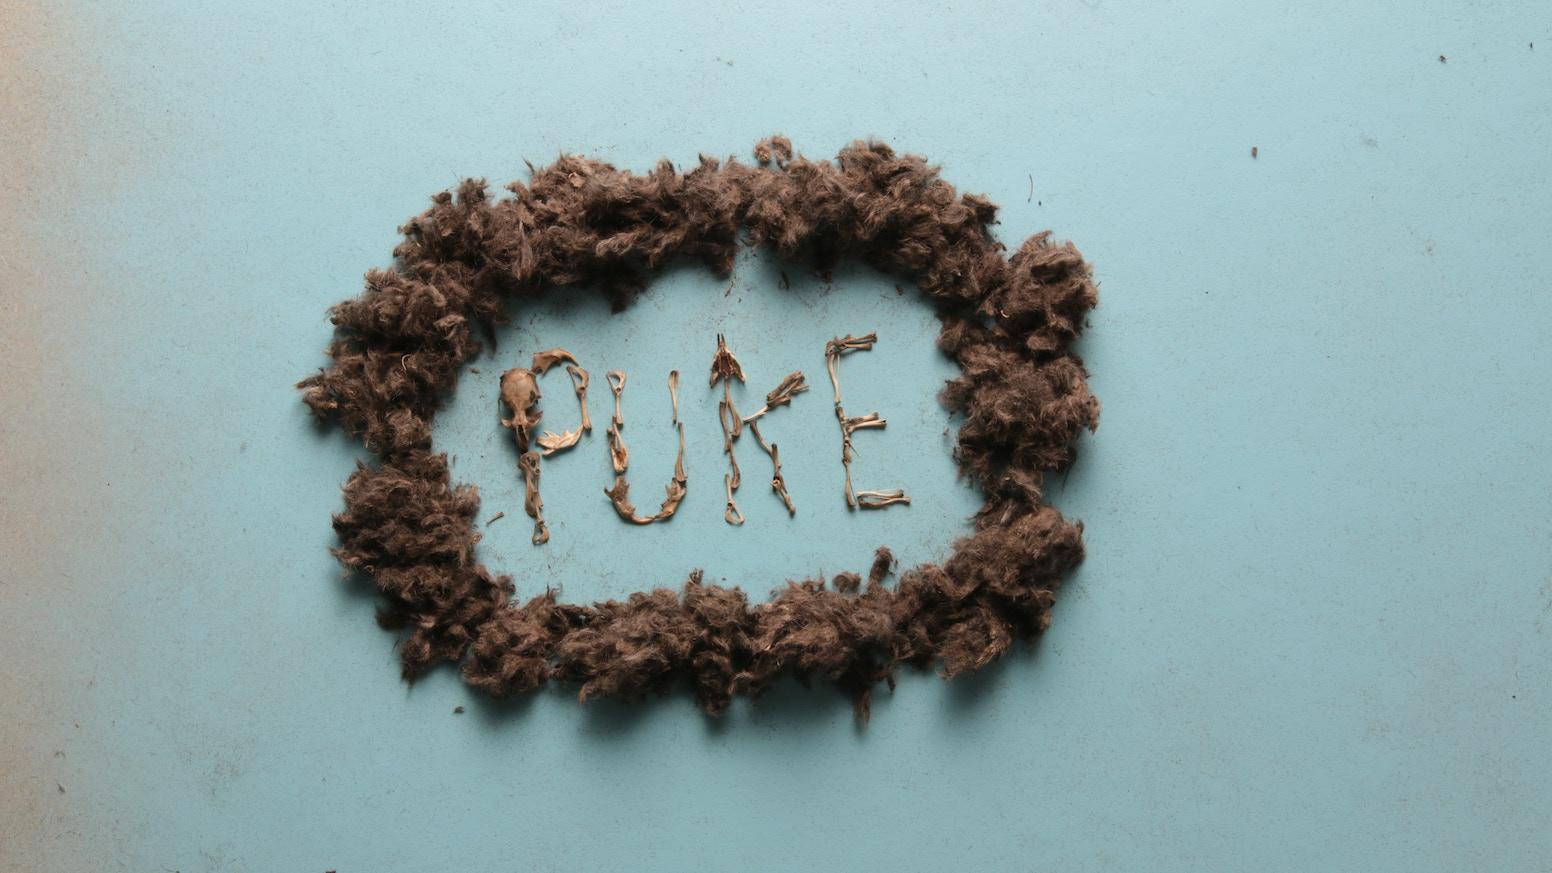 PUKE by Foster Huntington — Kickstarter